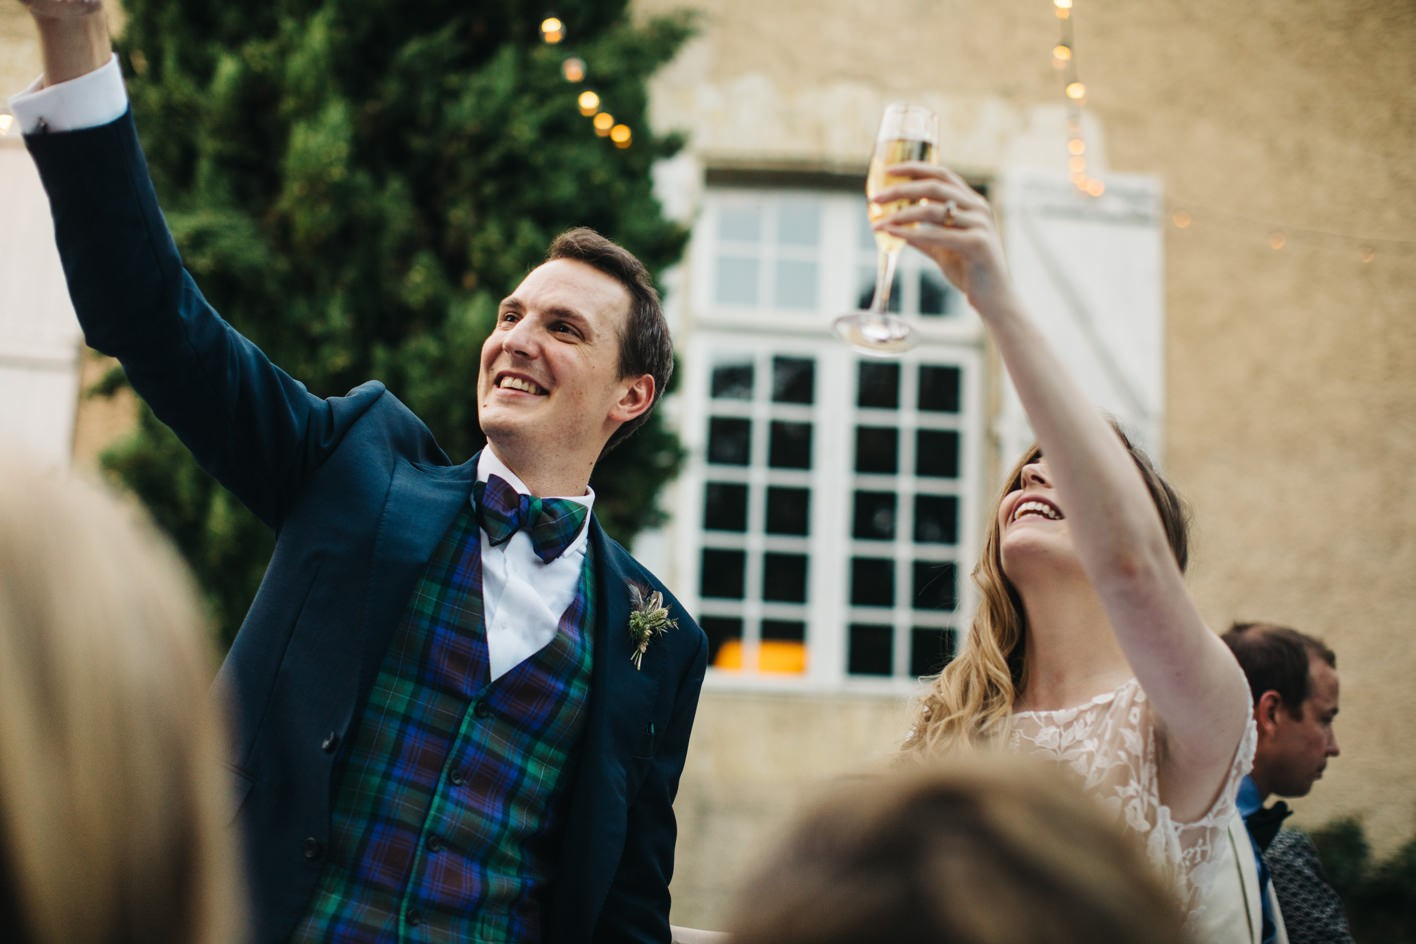 bride and groom raising their glasses